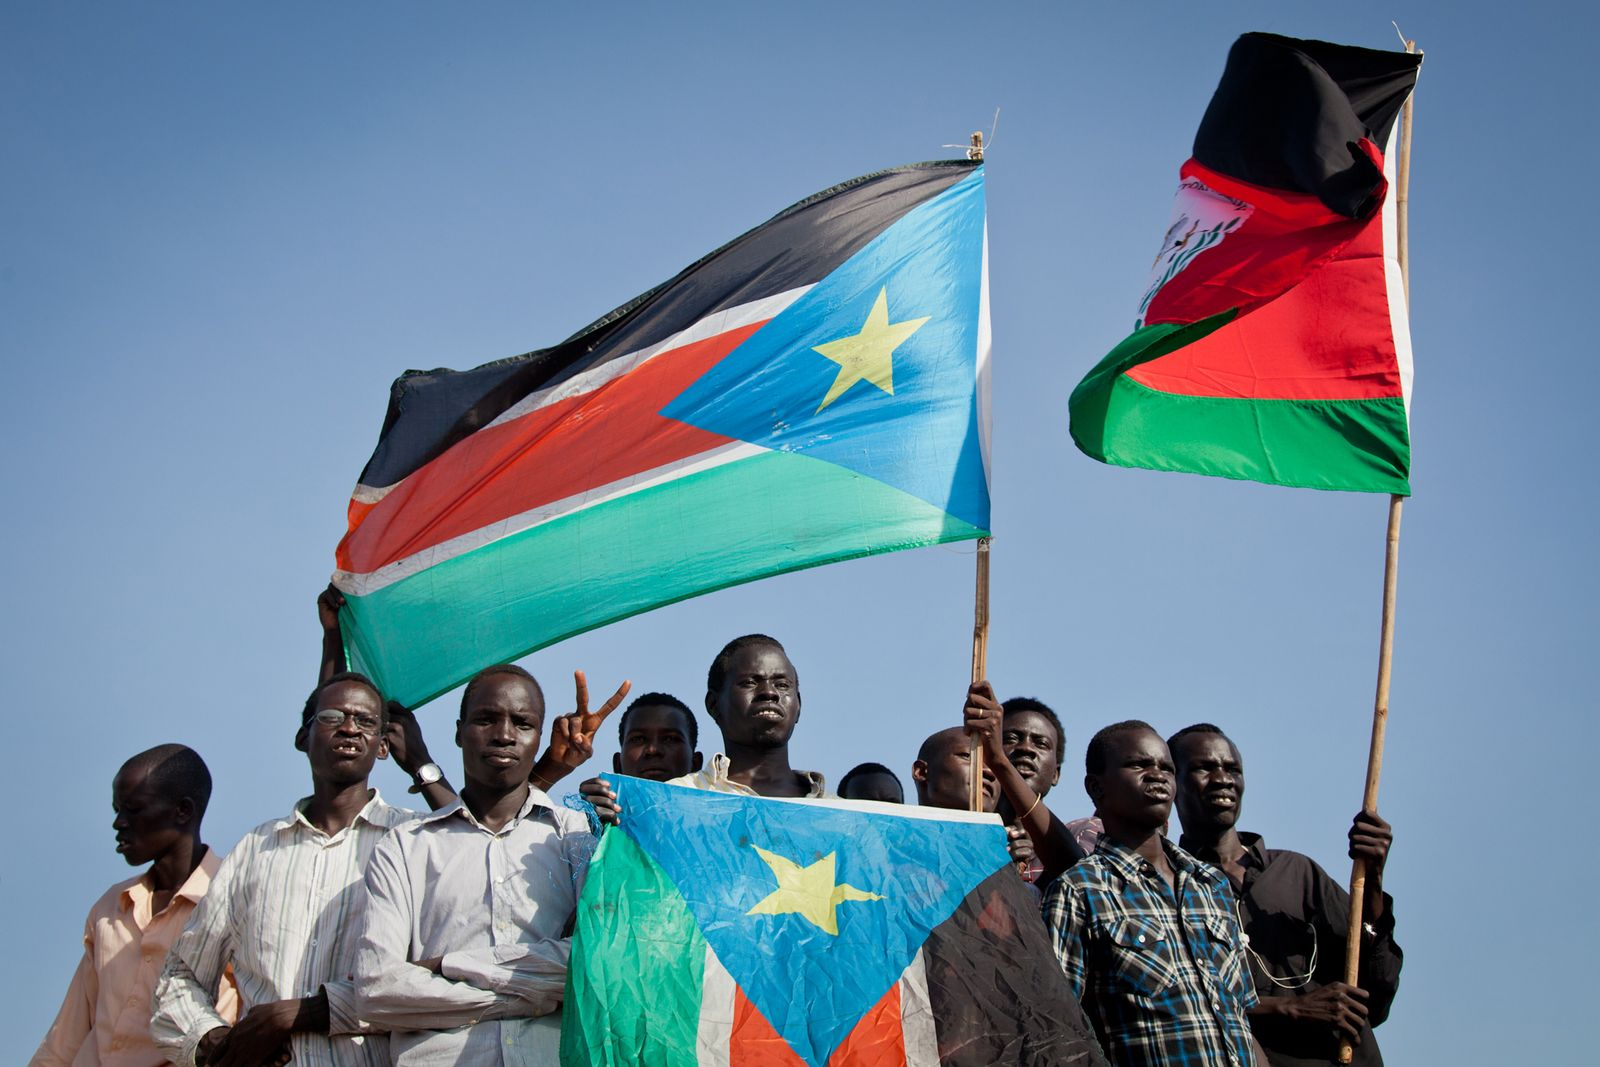 SSUDAN-SUDAN-UNREST-DEMO